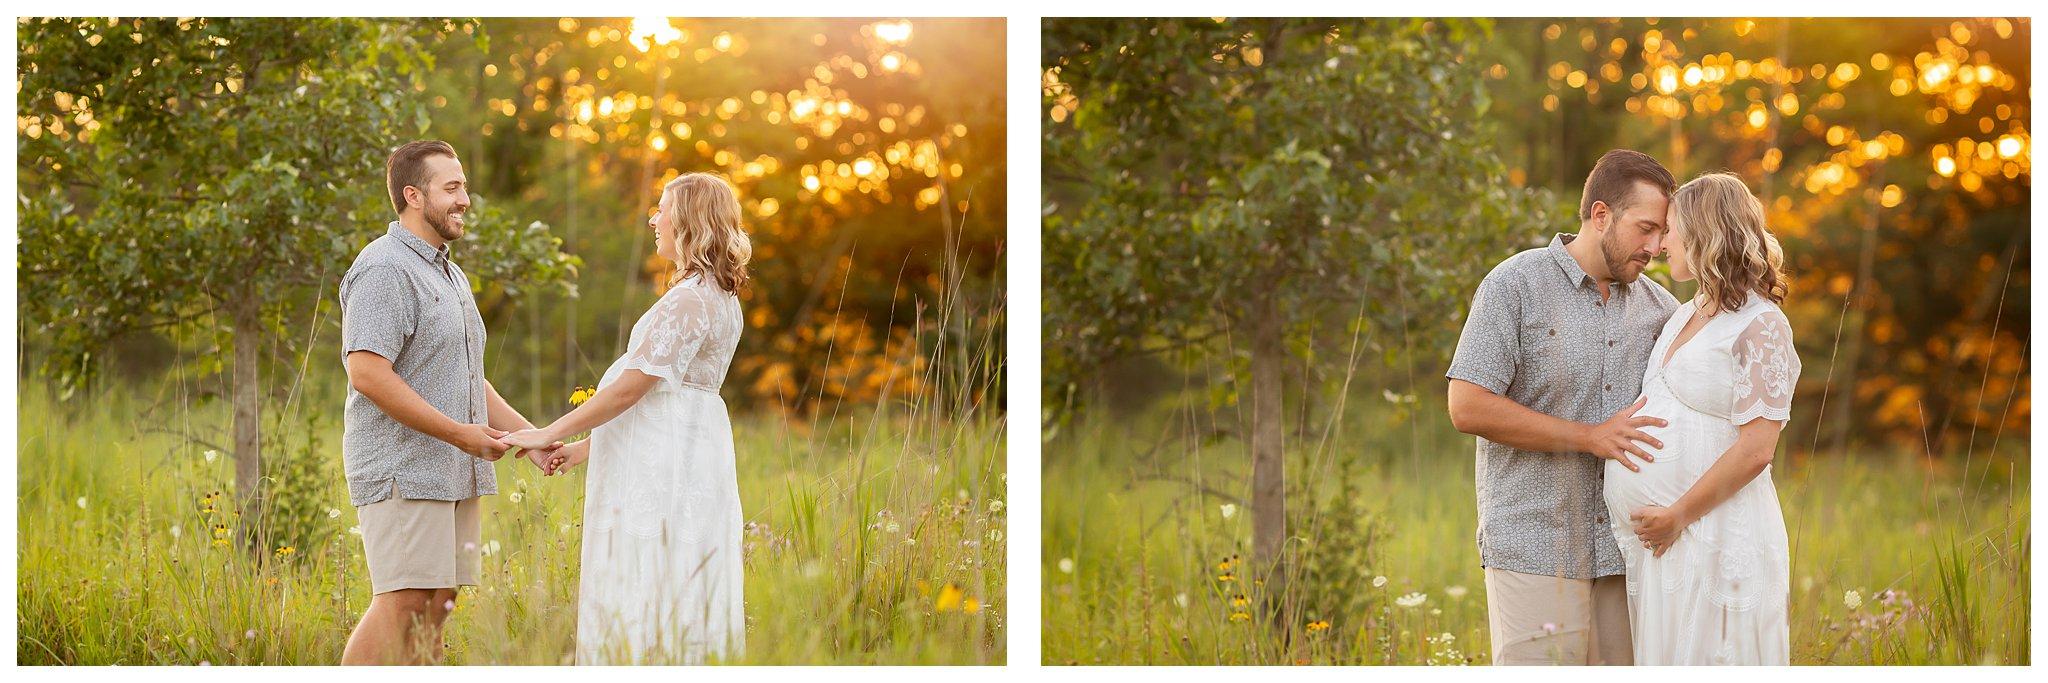 Summer Maternity Session | Ann Arbor Family Photographer